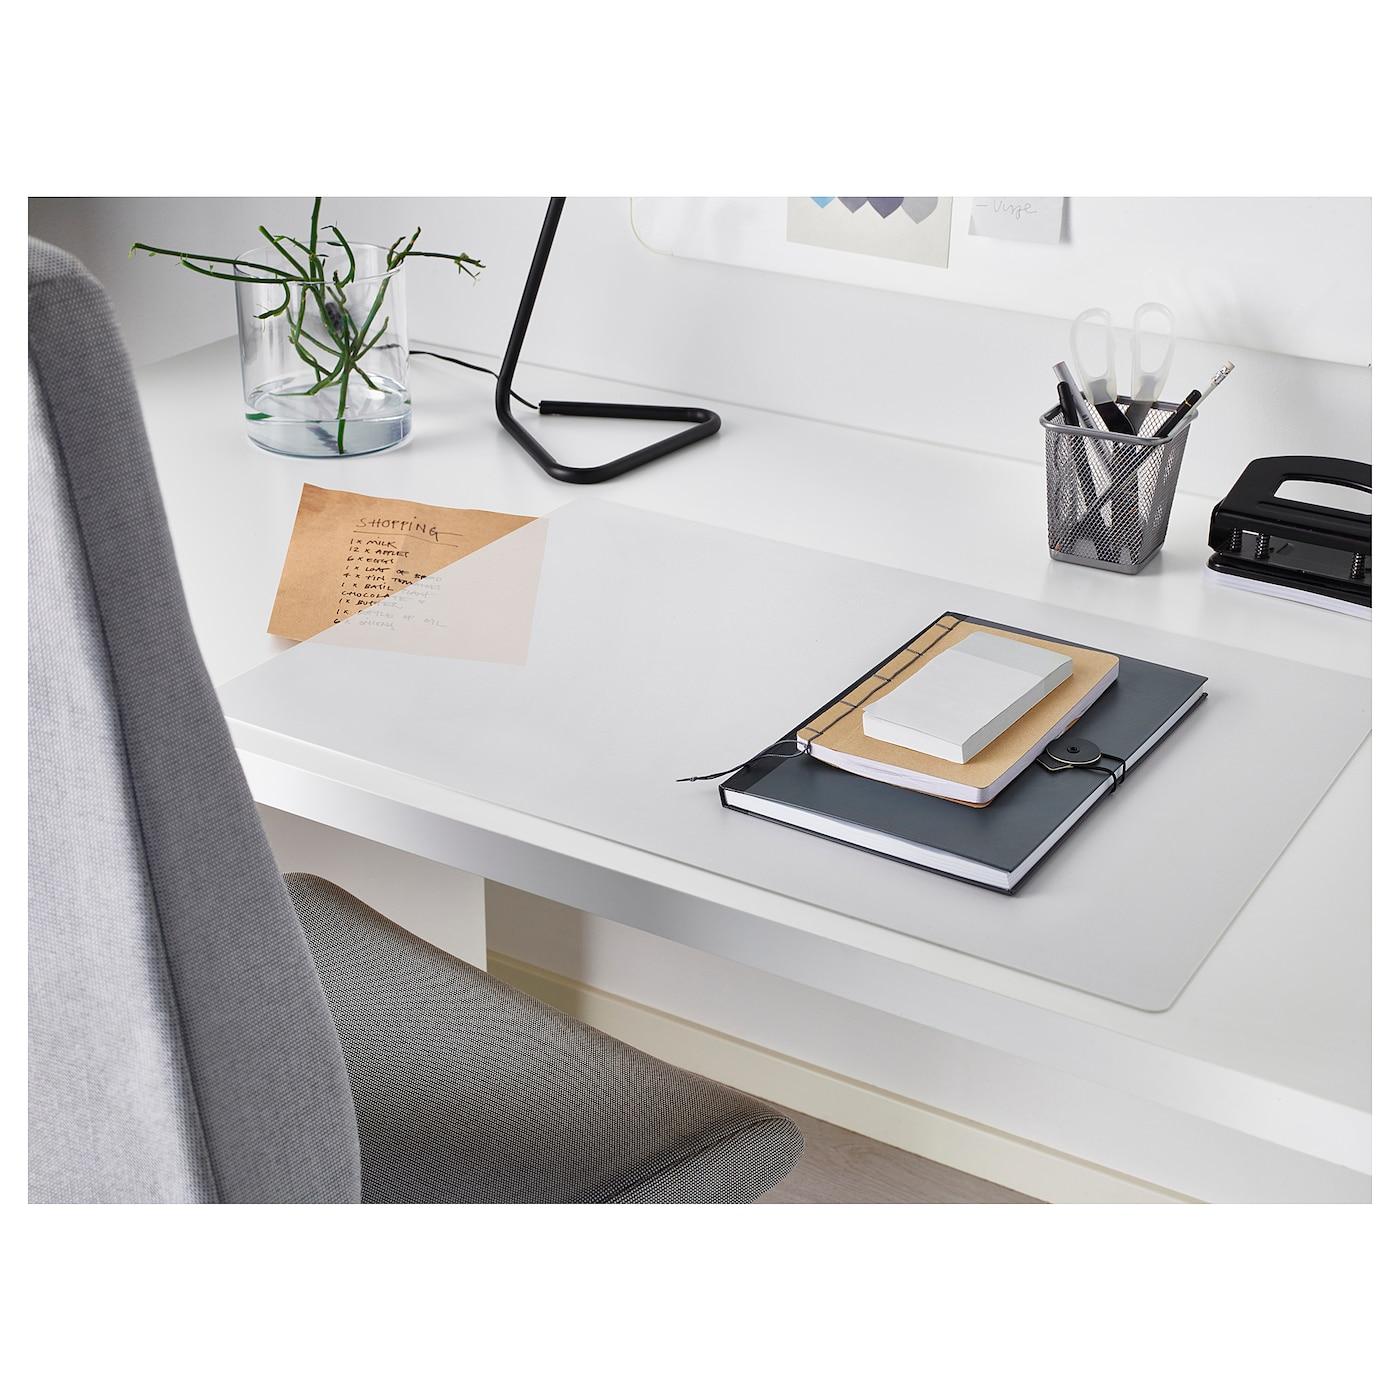 "SKVALLRA Desk pad, white/transparent, 15x22 ¾ """